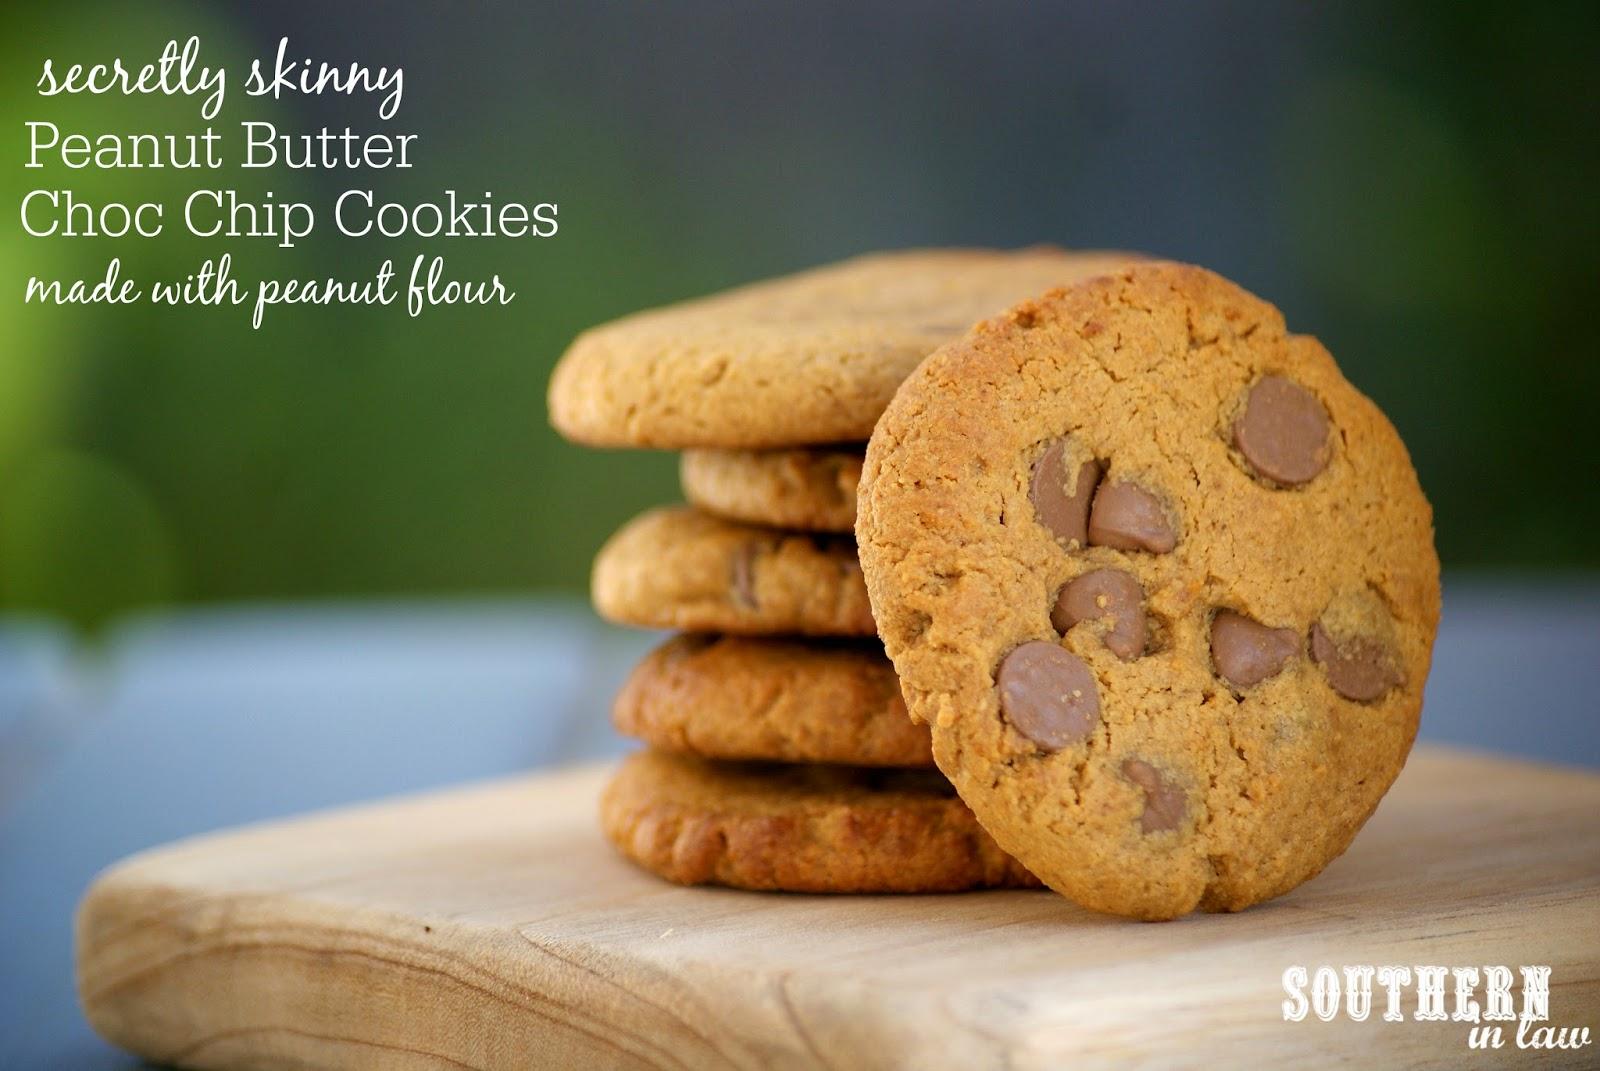 Low Fat Peanut Butter Chocolate Chip Cookie Recipe - low fat, gluten free, healthy, low sugar - Peanut Flour Cookies Recipe